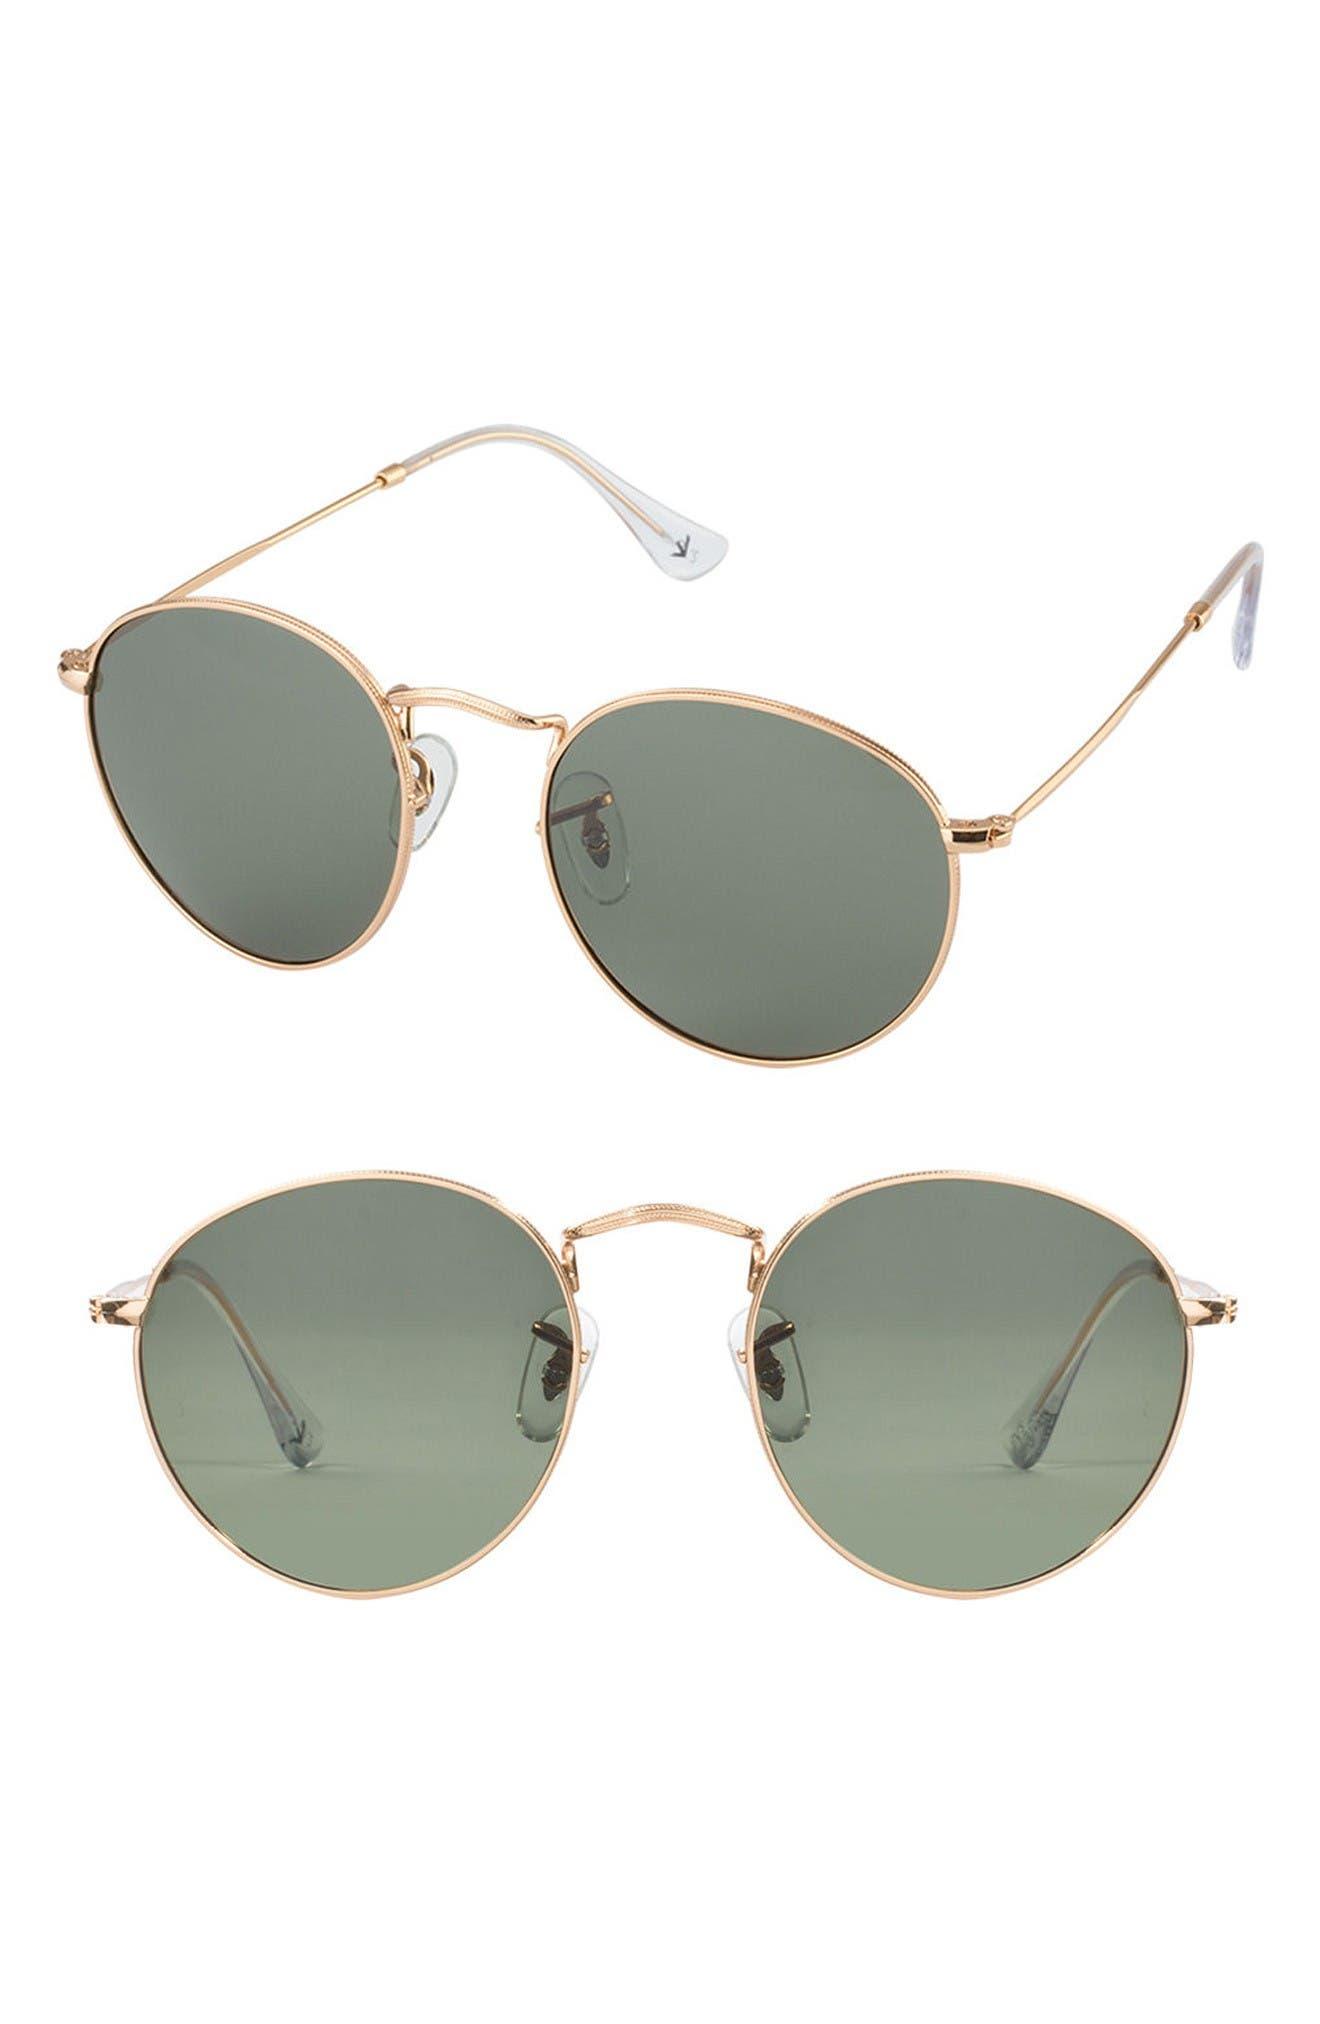 PERVERSE Orleans 50mm Sunglasses